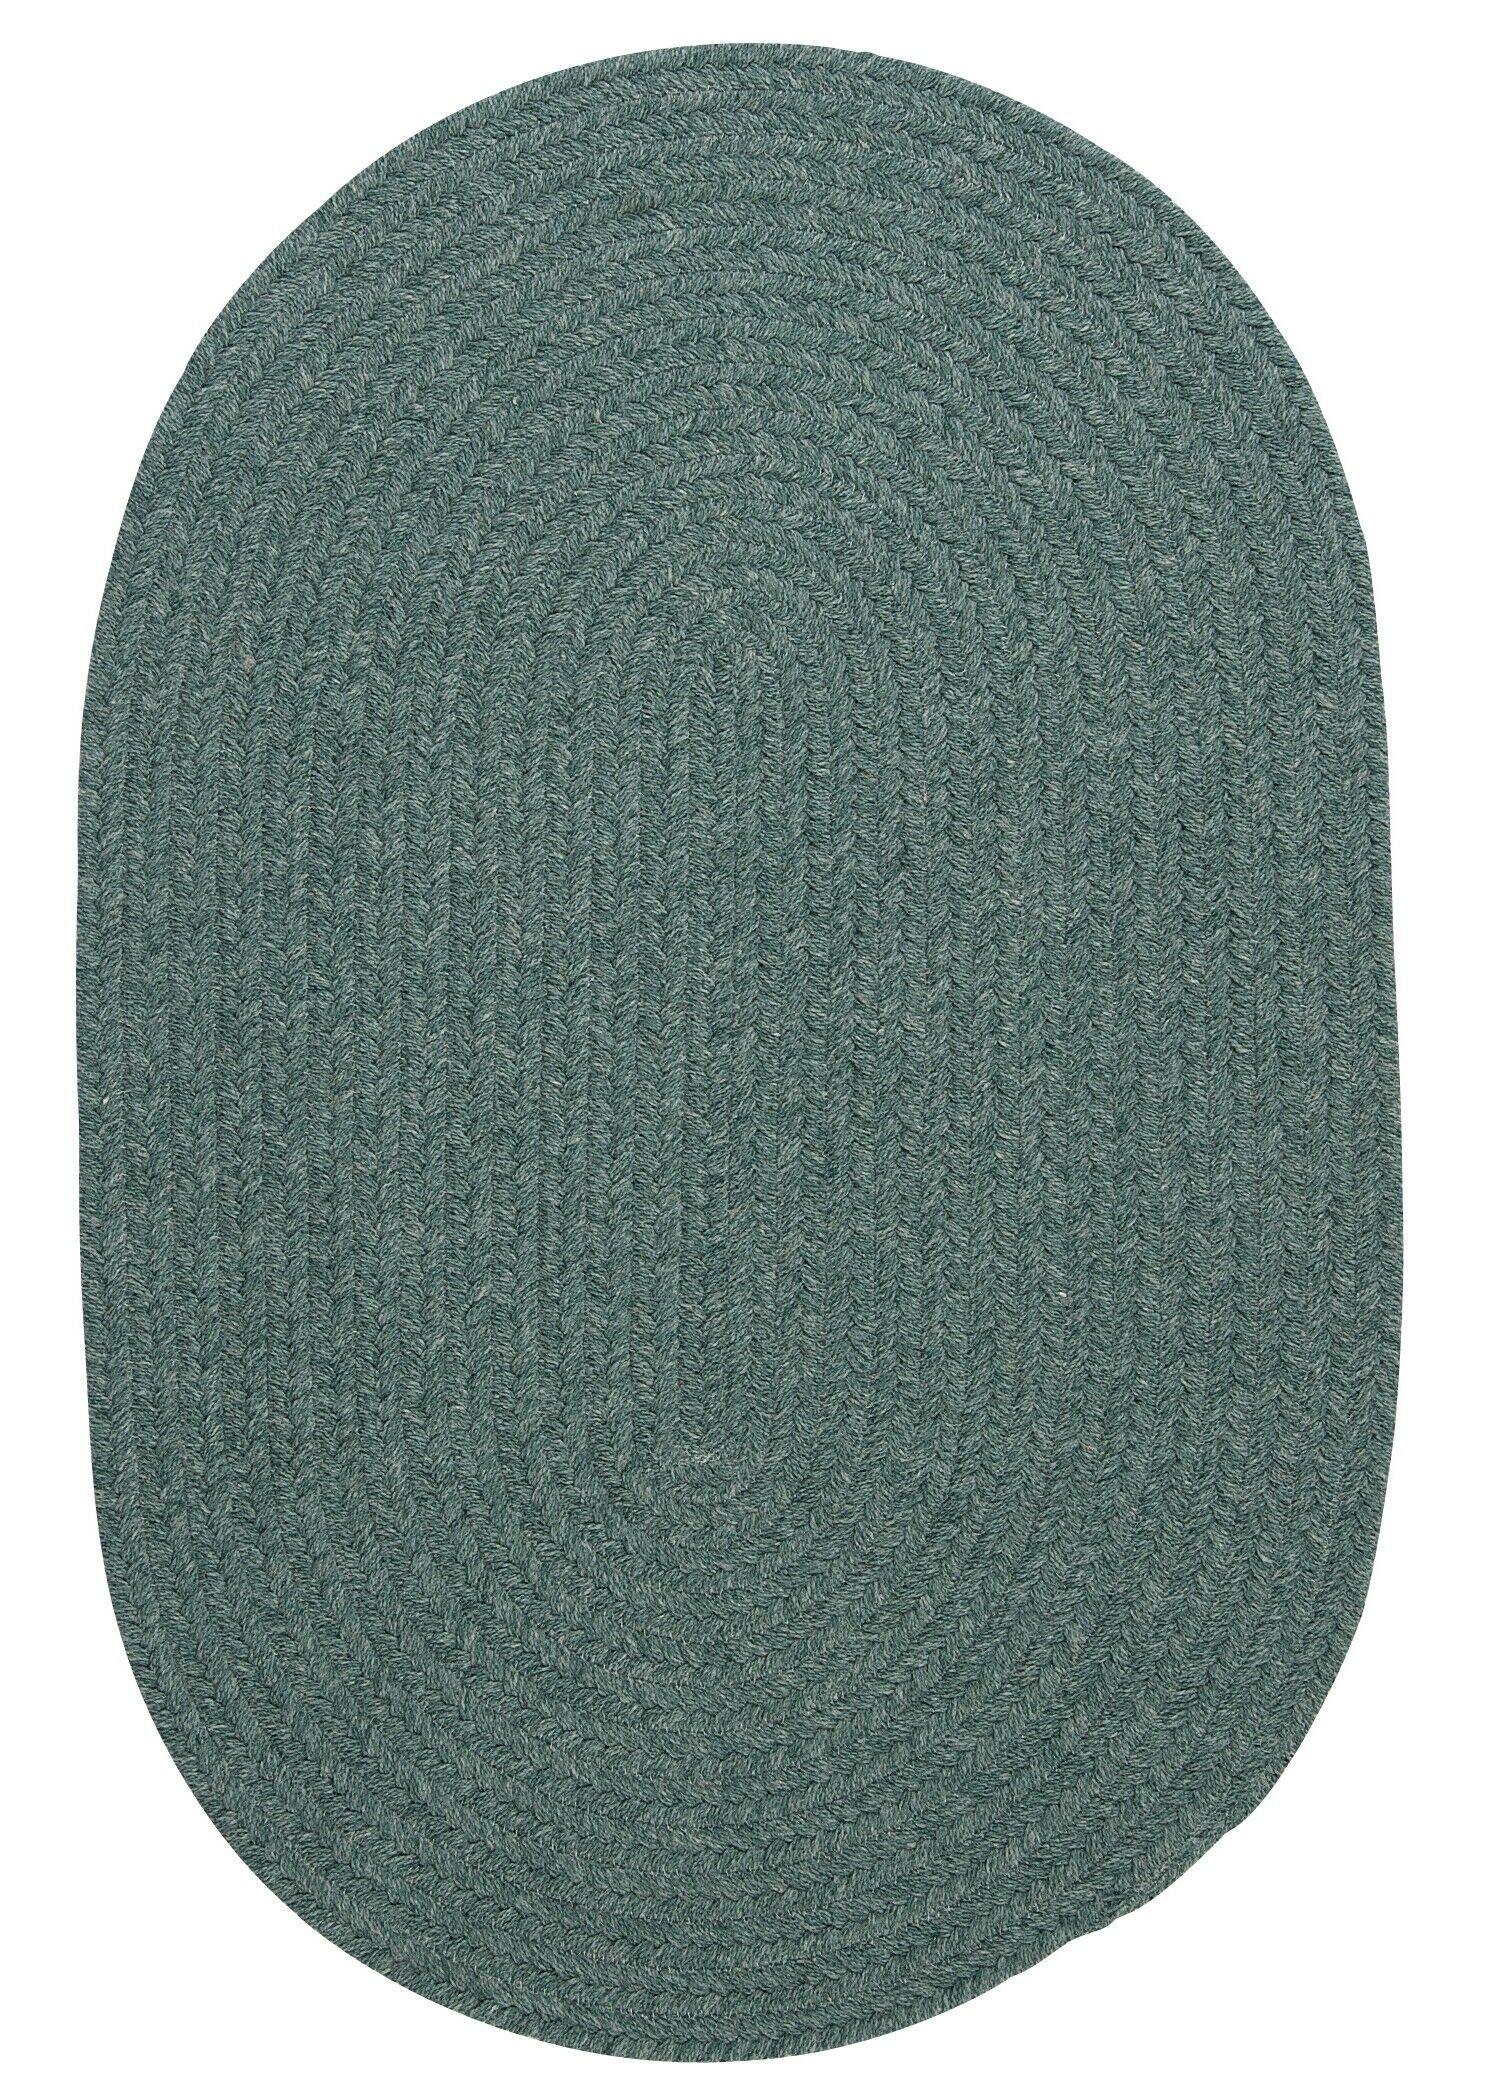 Navarrette Teal Area Rug Rug Size: Round 10'